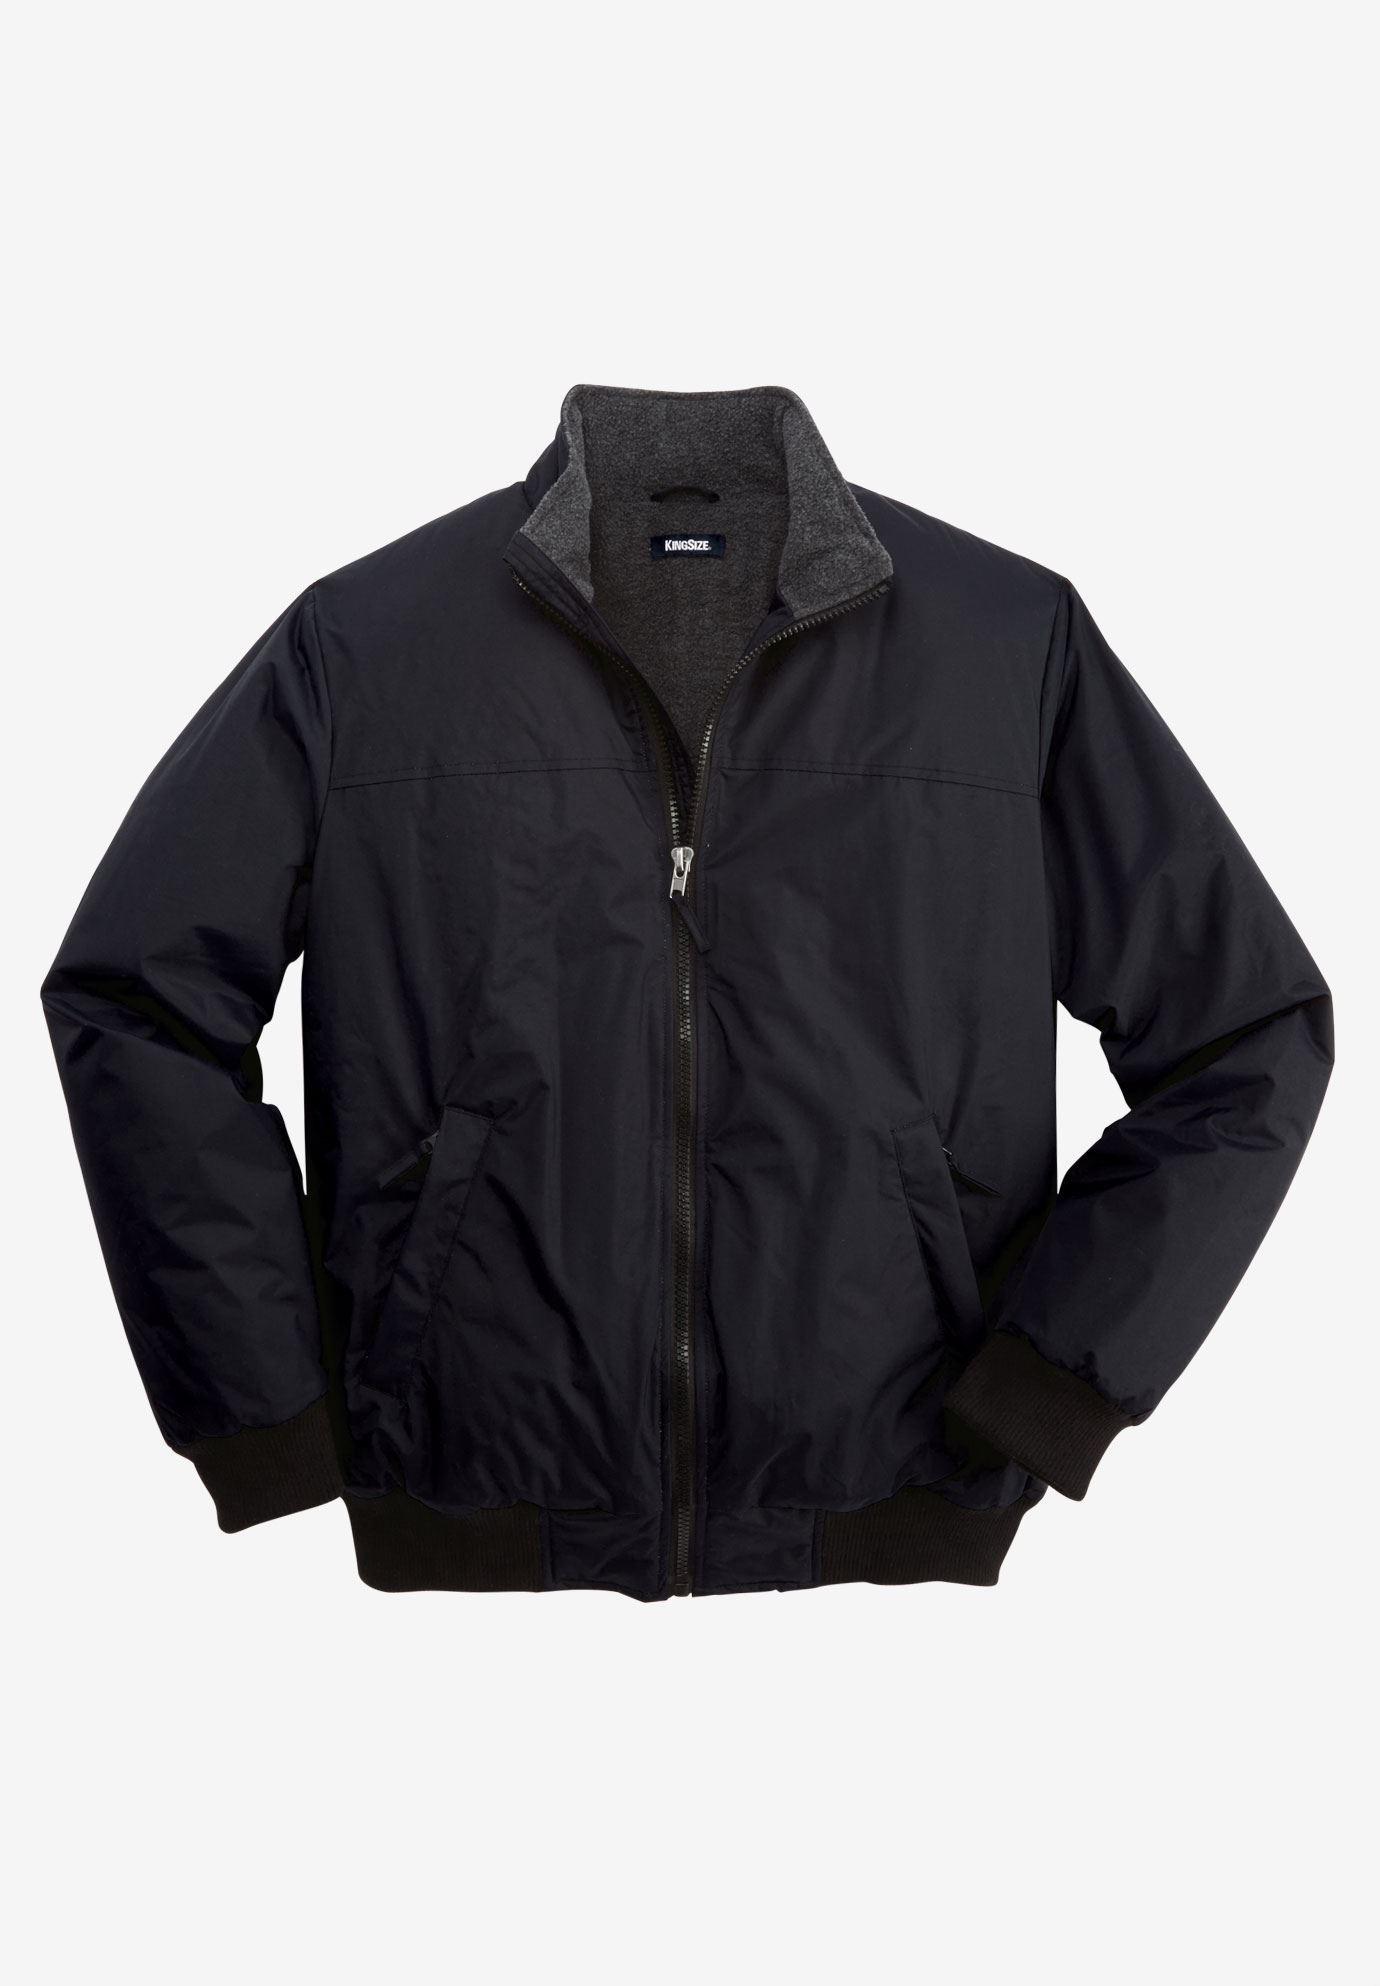 86cda2d6949f Fleece-Lined Bomber Jacket  Big and Tall Coats & Parkas   King Size